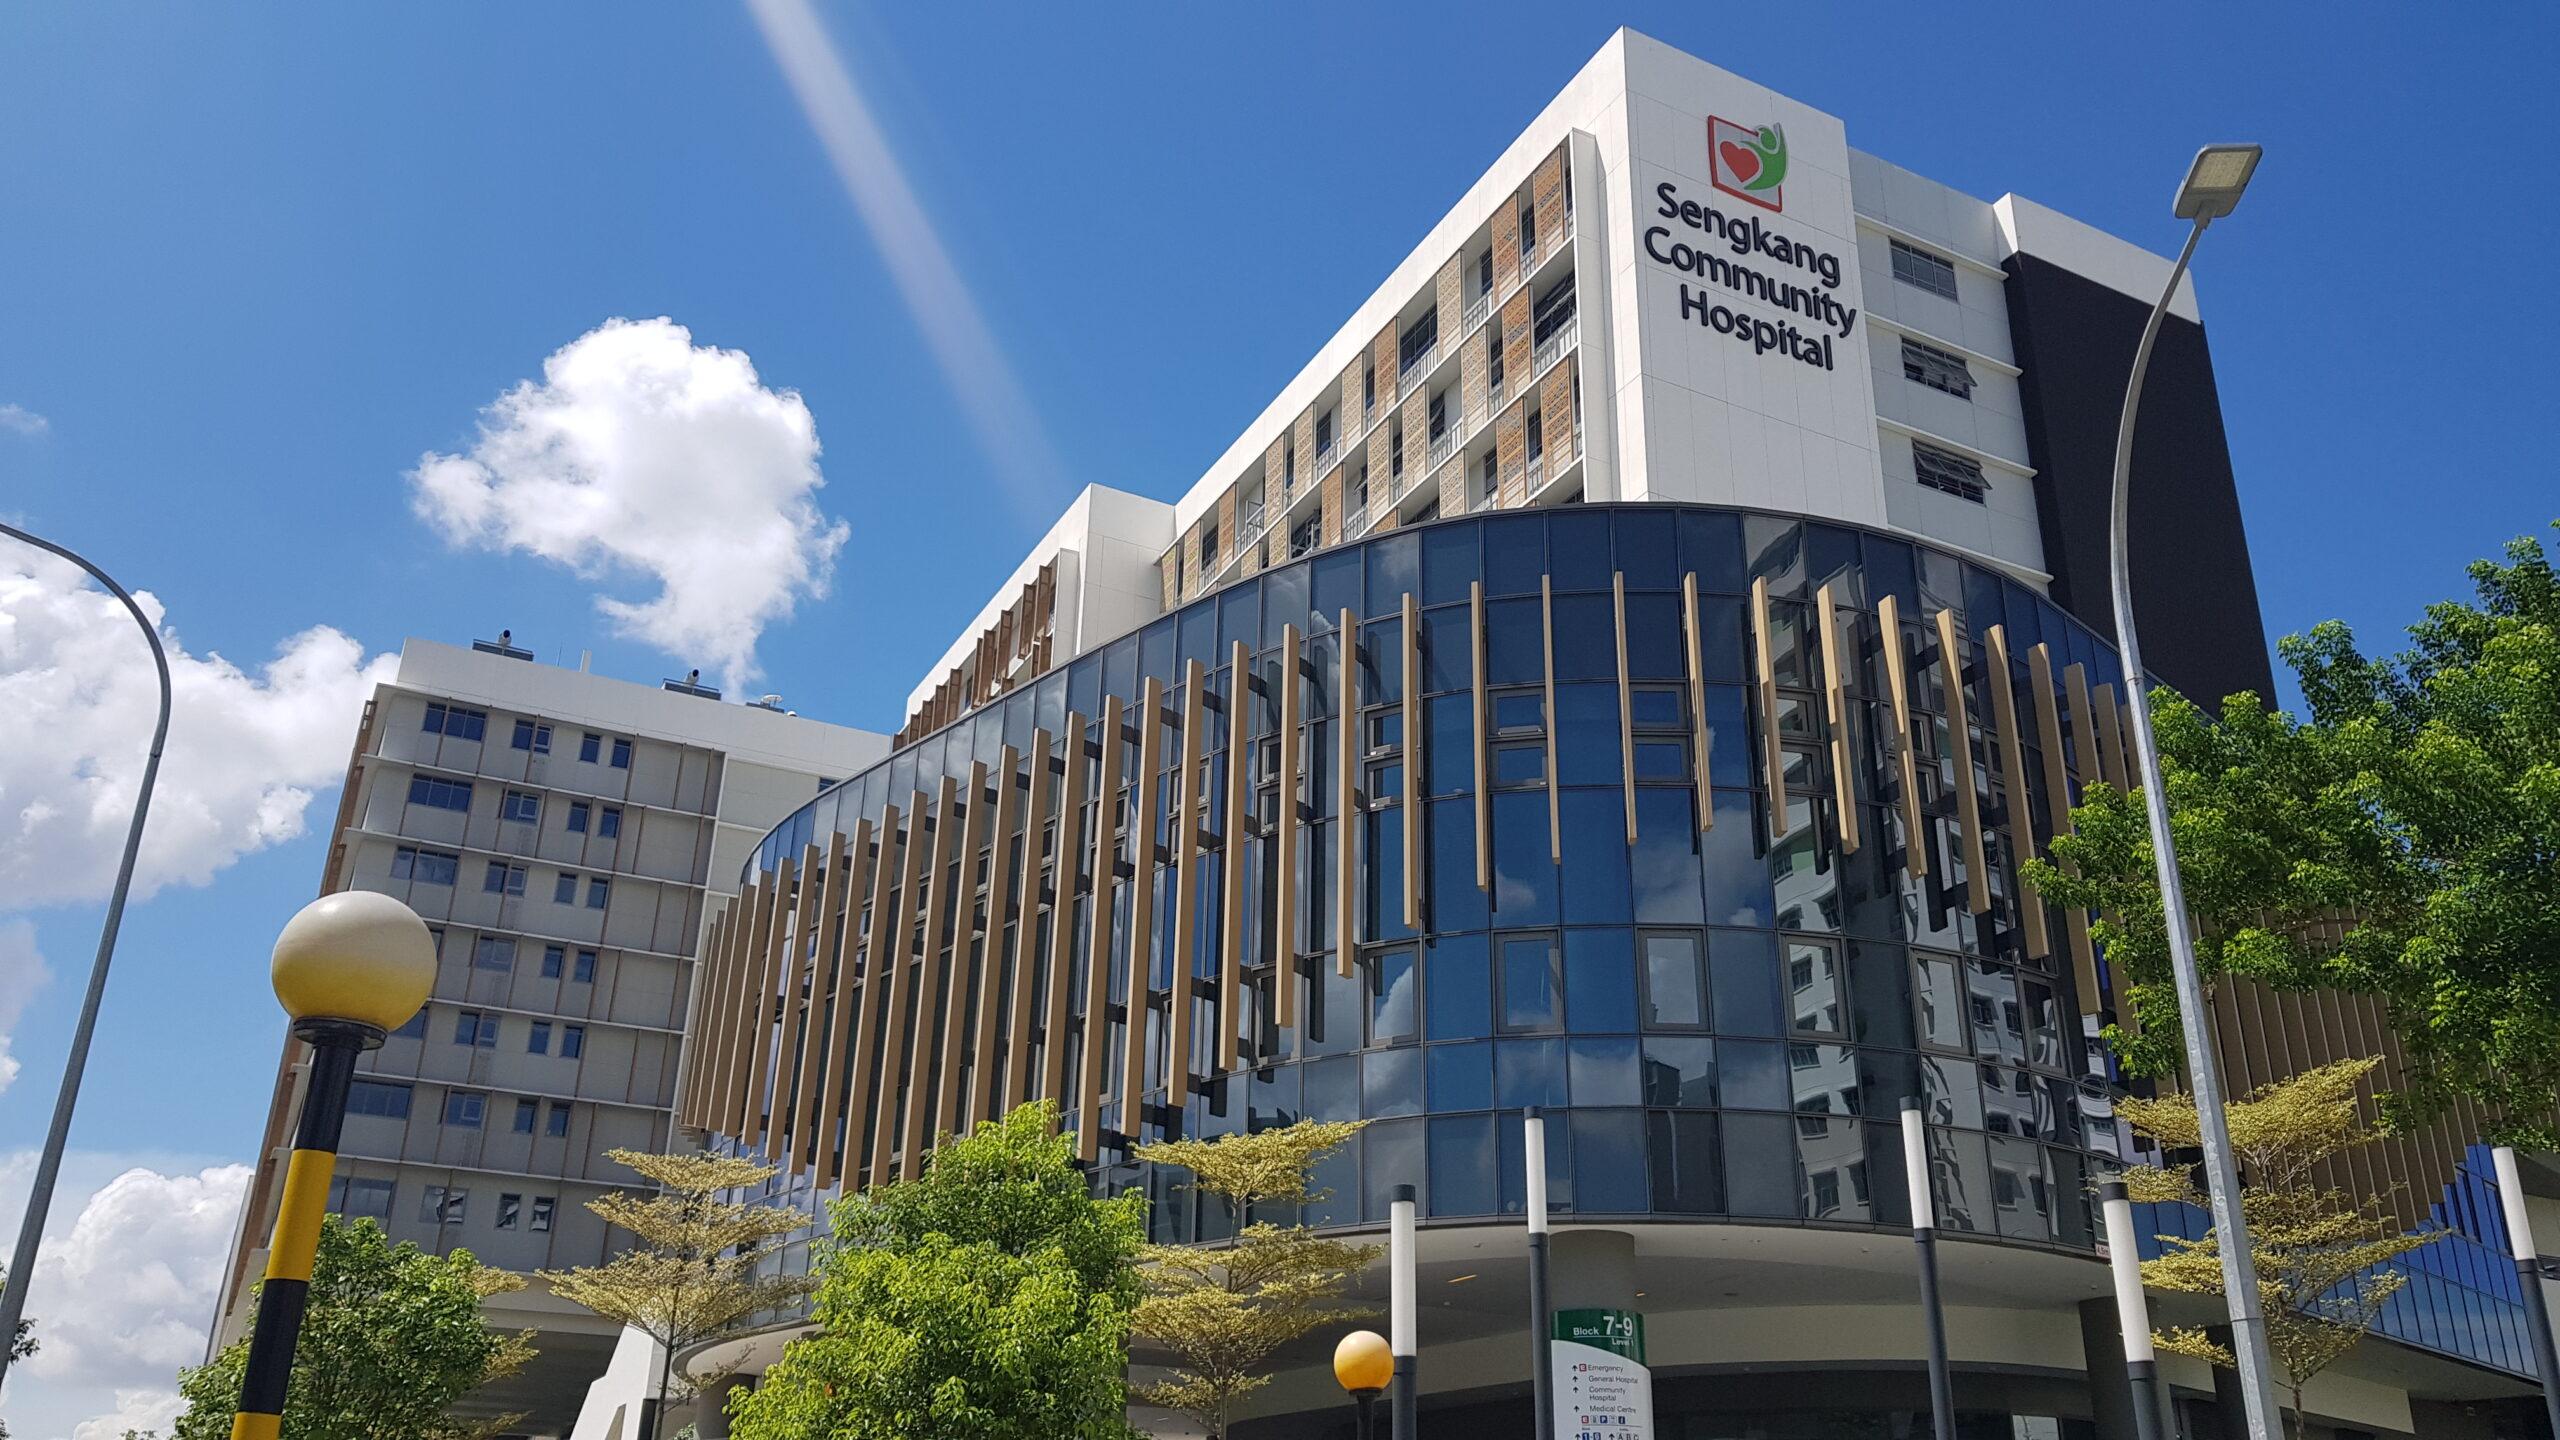 Sengkang Community Hospital